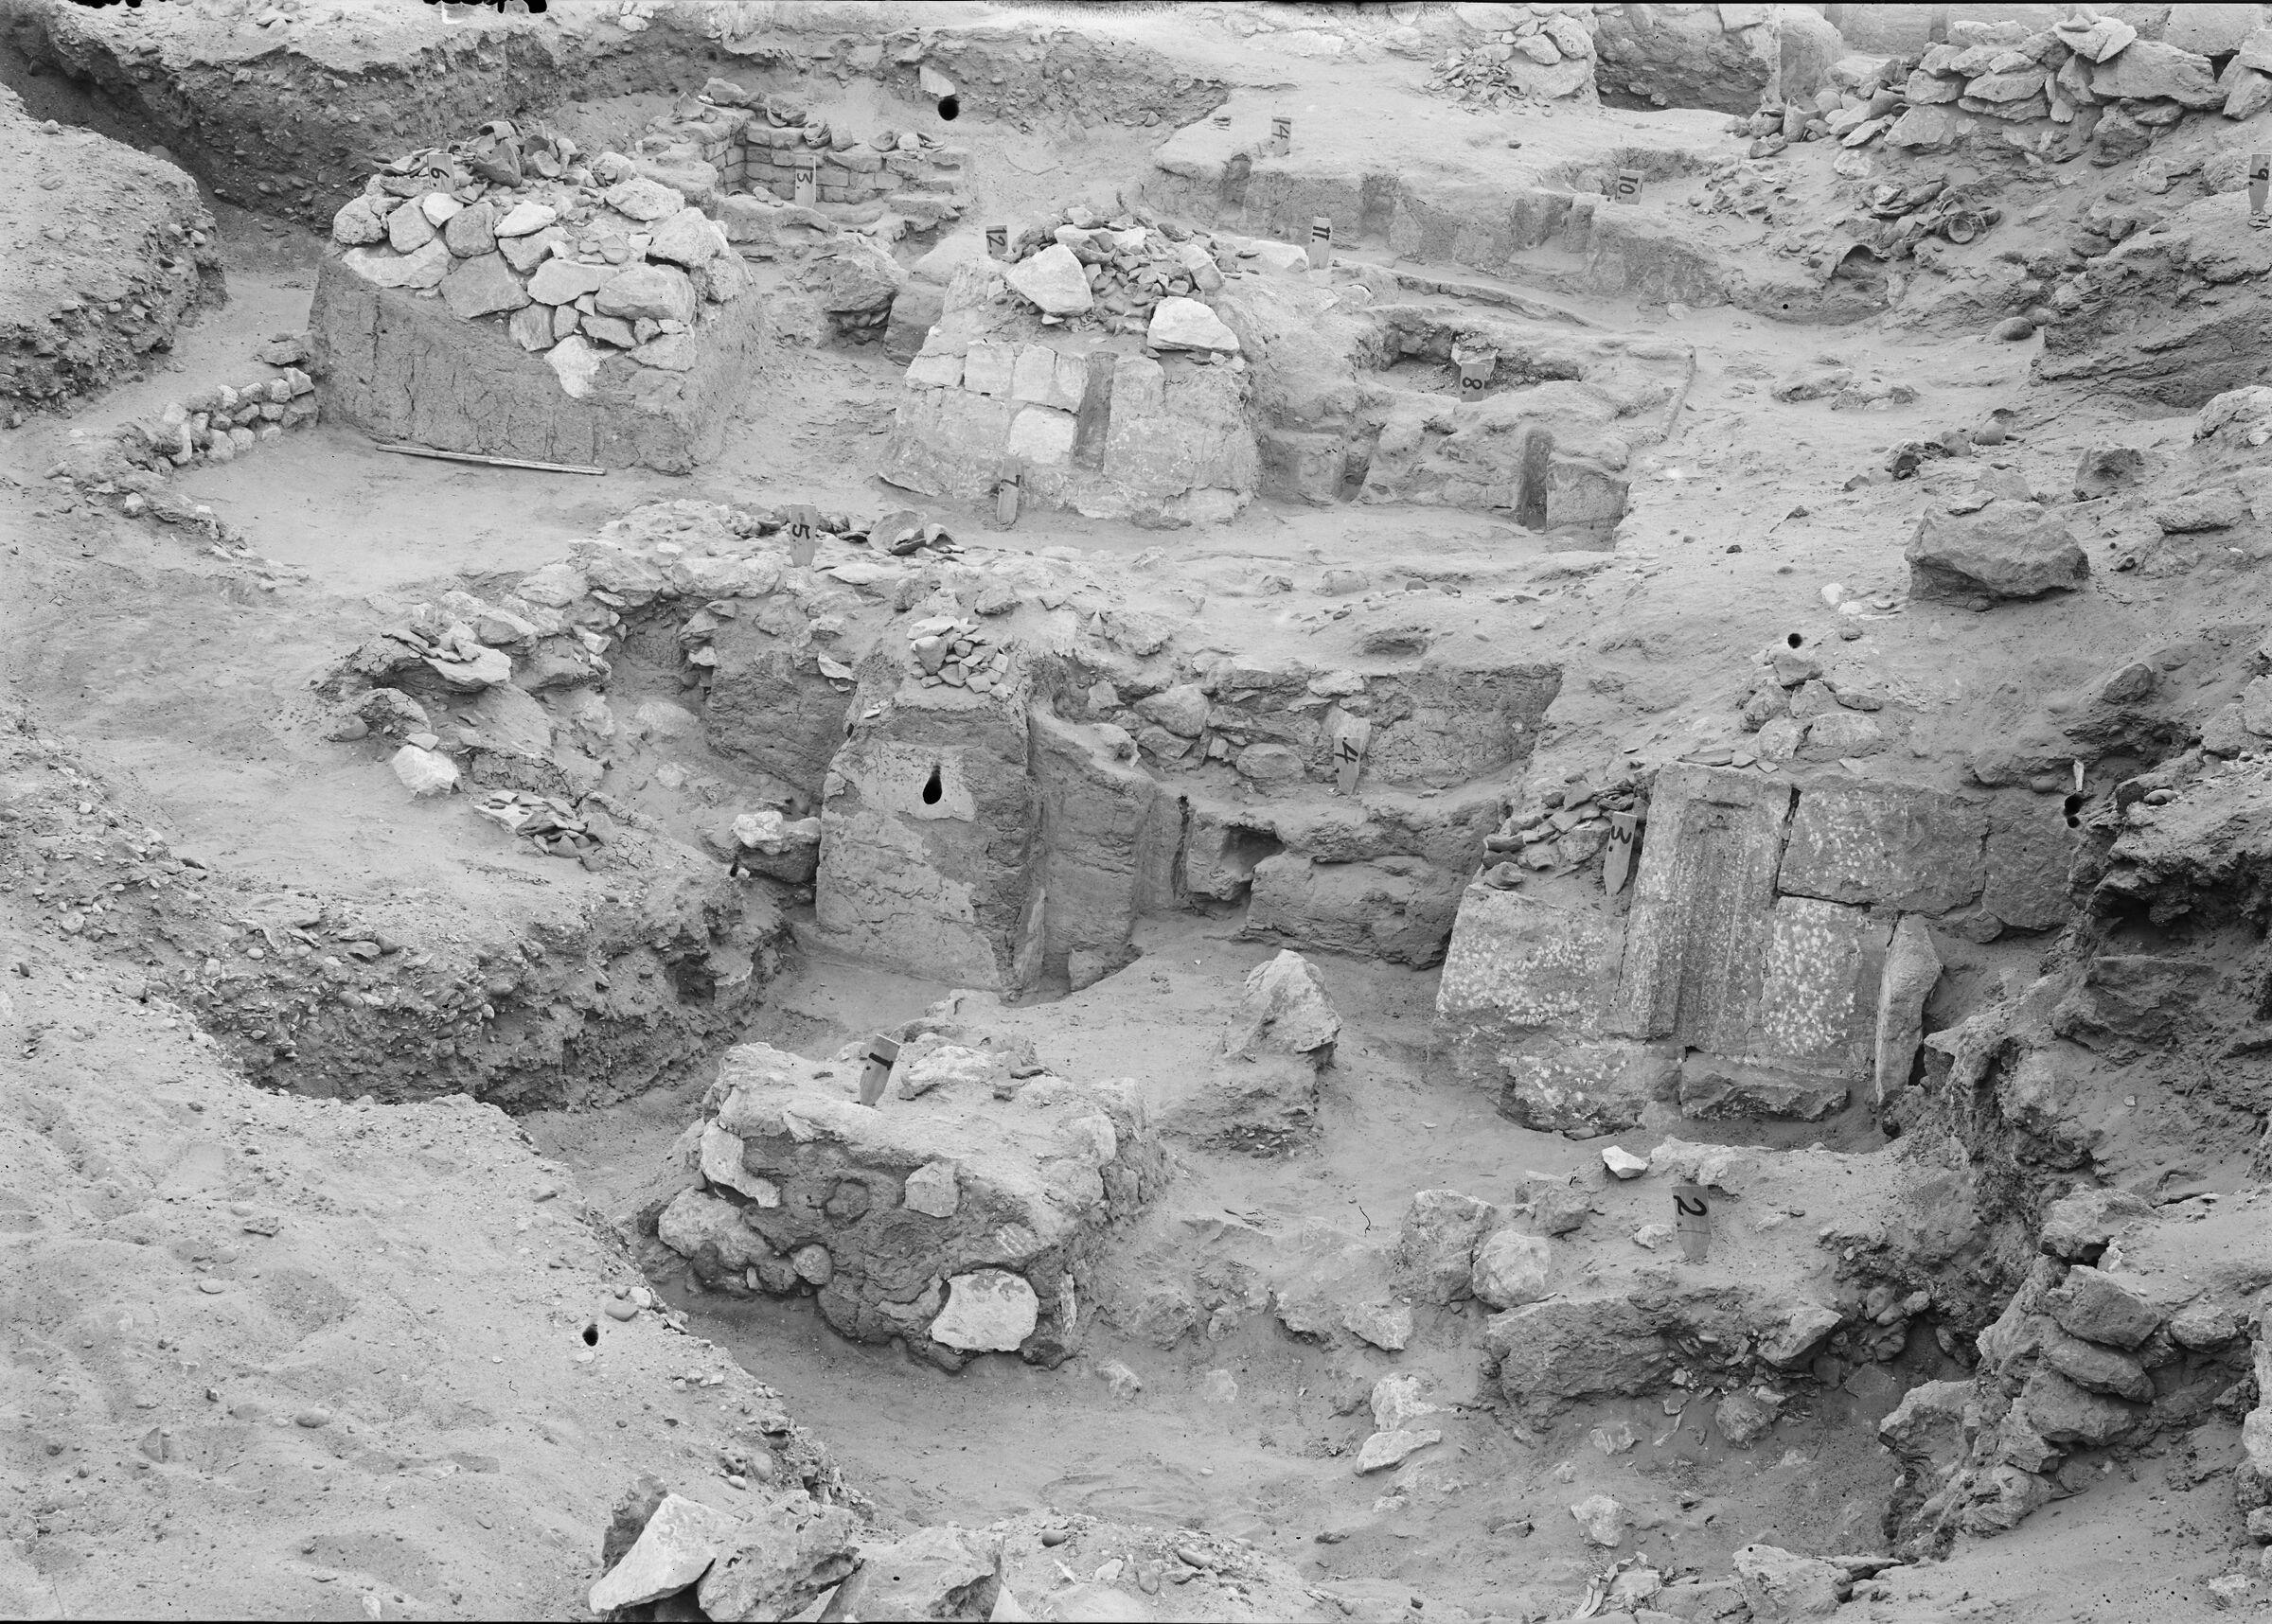 Wadi Cemetery (Reisner; north of W. Cem): Site: Giza; View: GW 1, GW 2, GW 3, GW 4, GW 5, GW 6, GW 7, GW 8, GW 10, GW 12, GW 13, GW 14